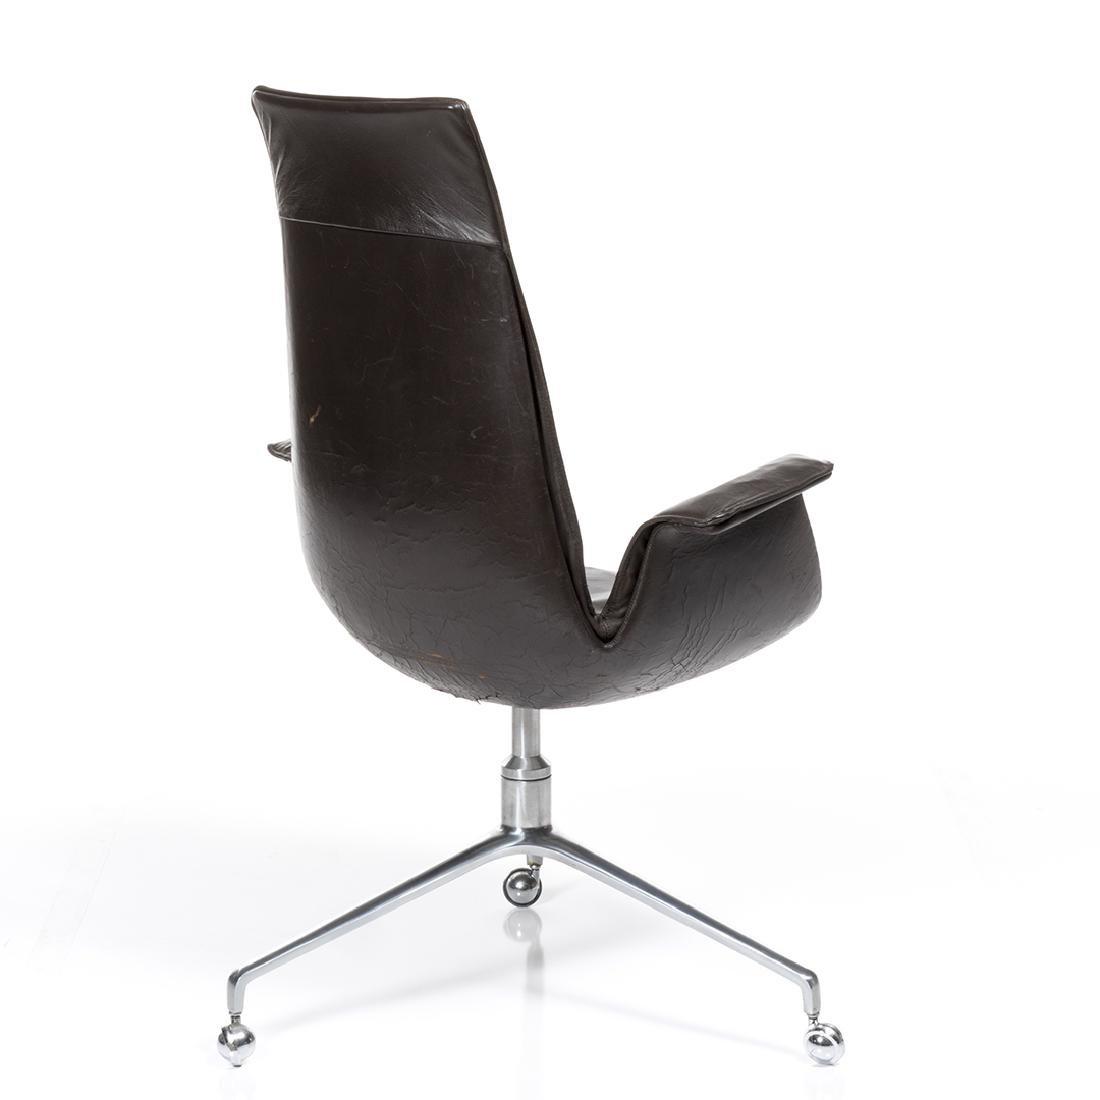 Preben Fabricius Tulip Chair - 3